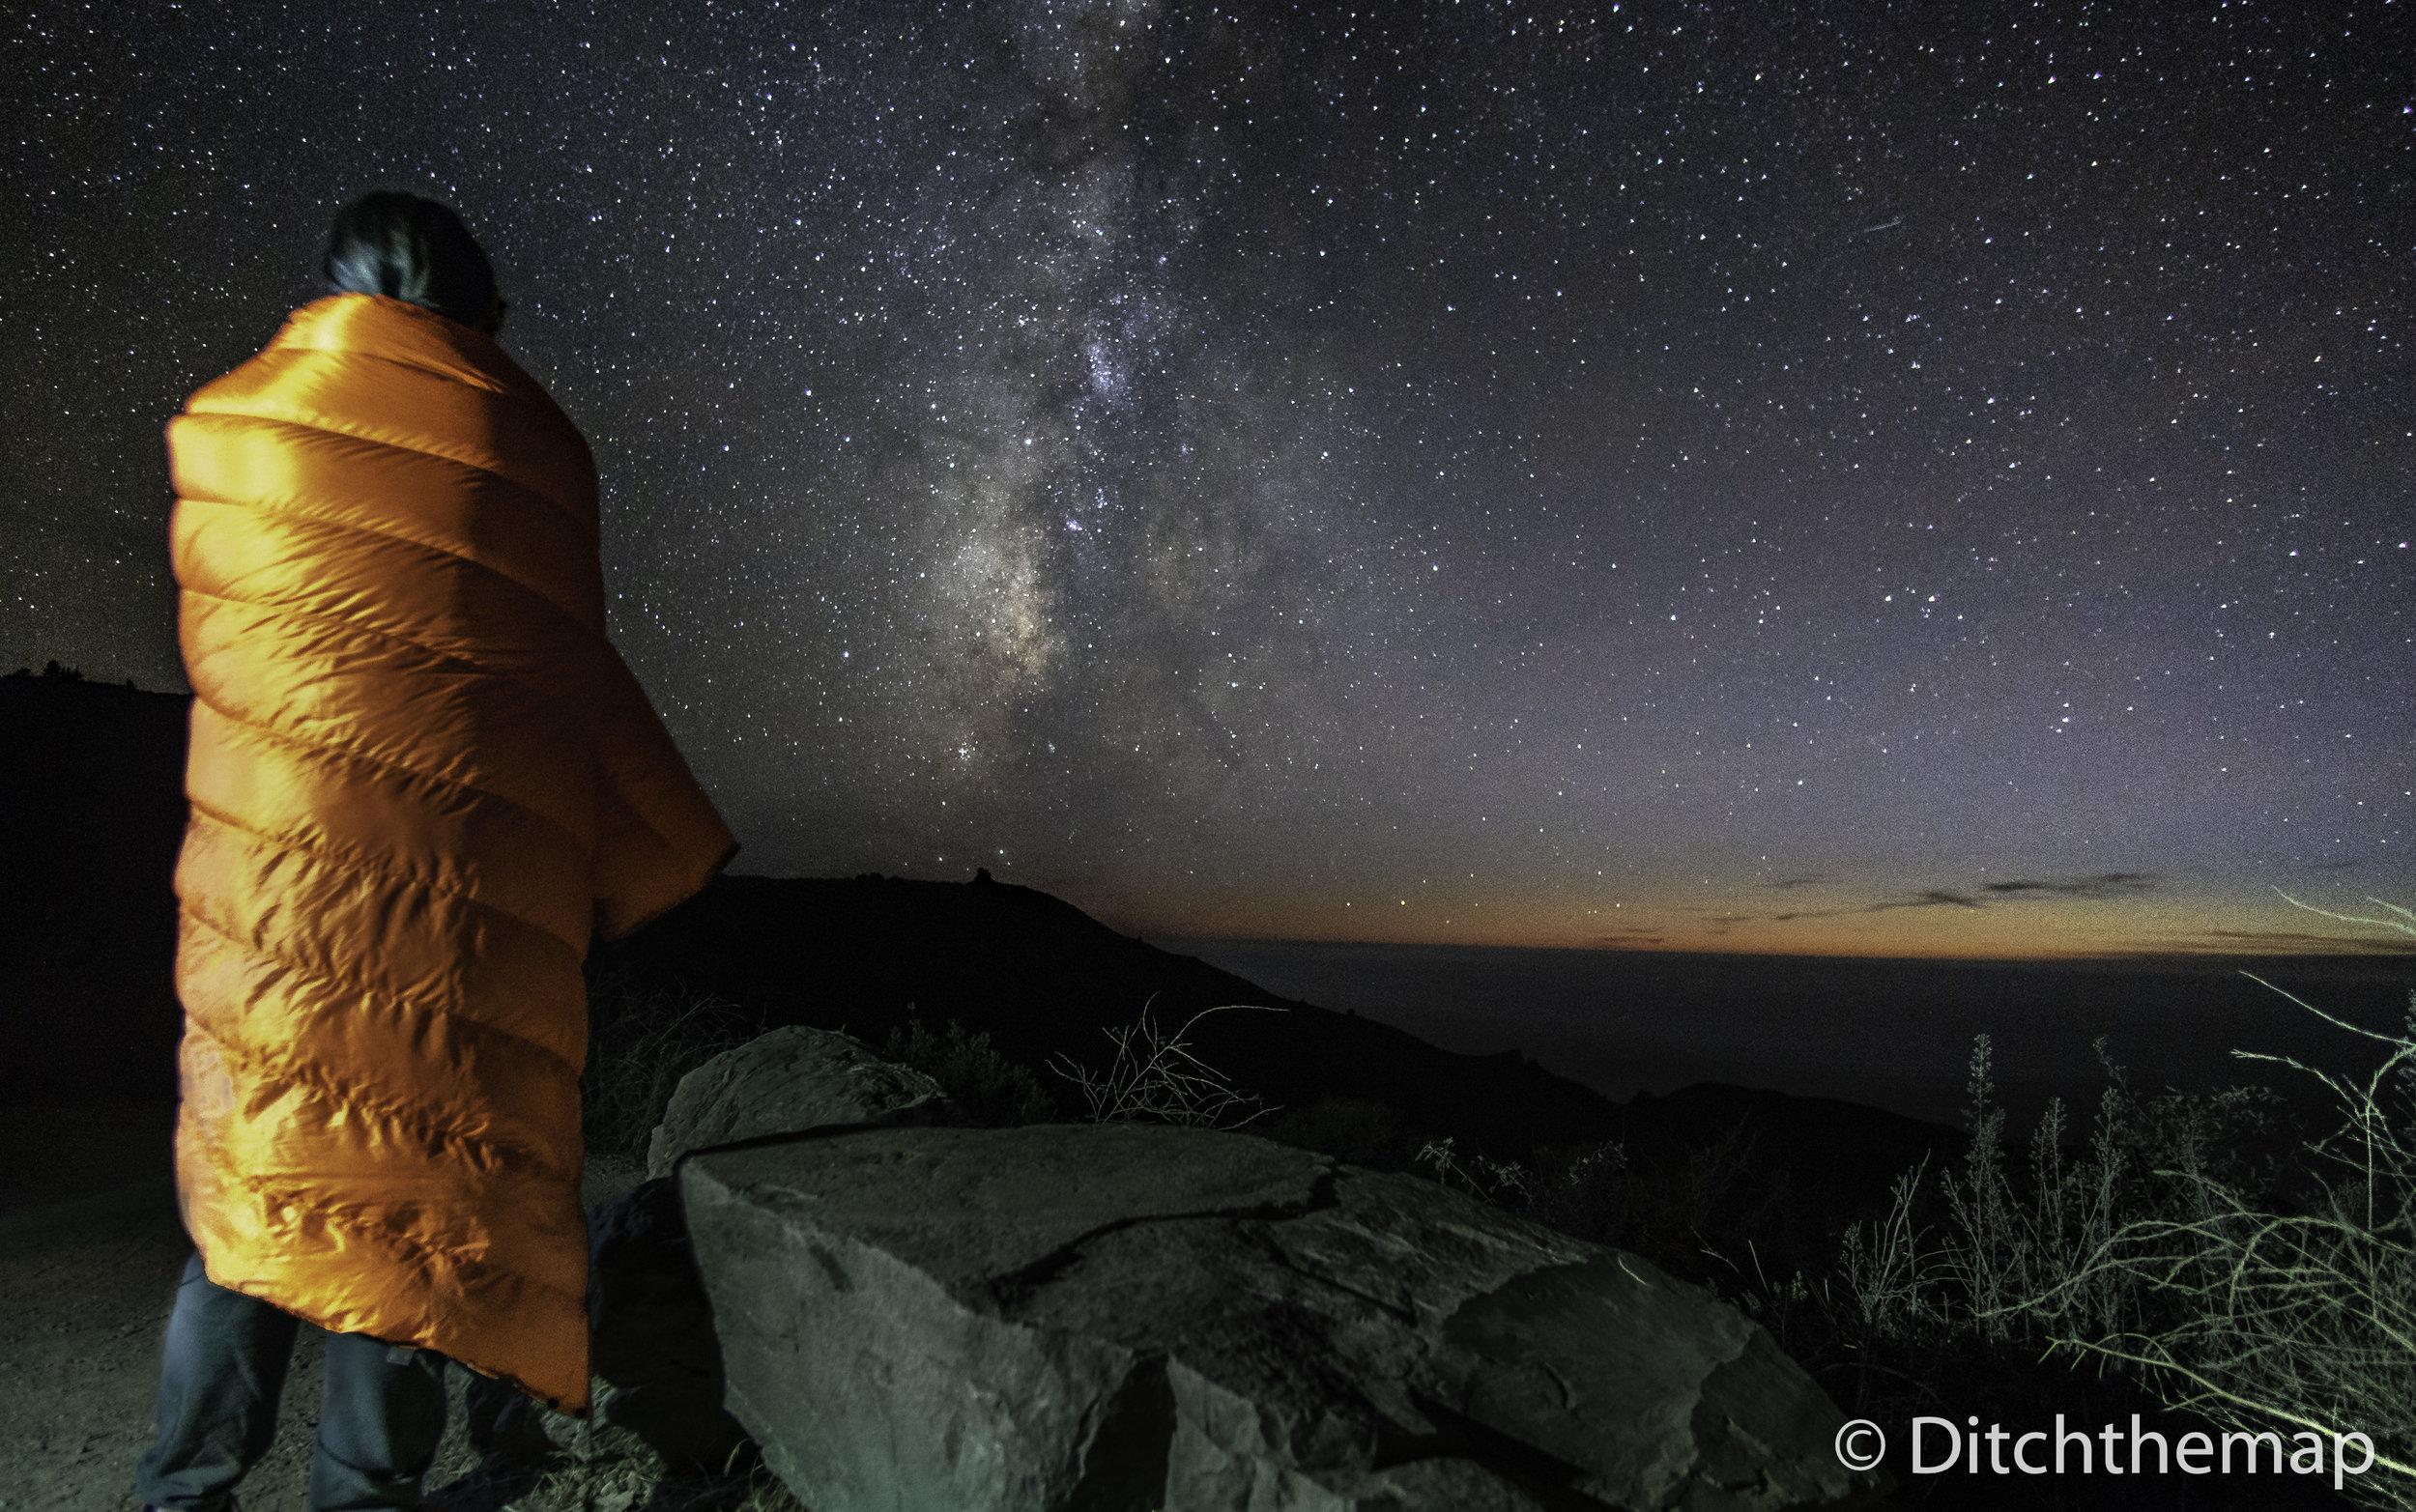 Night Landscape of Milky Way